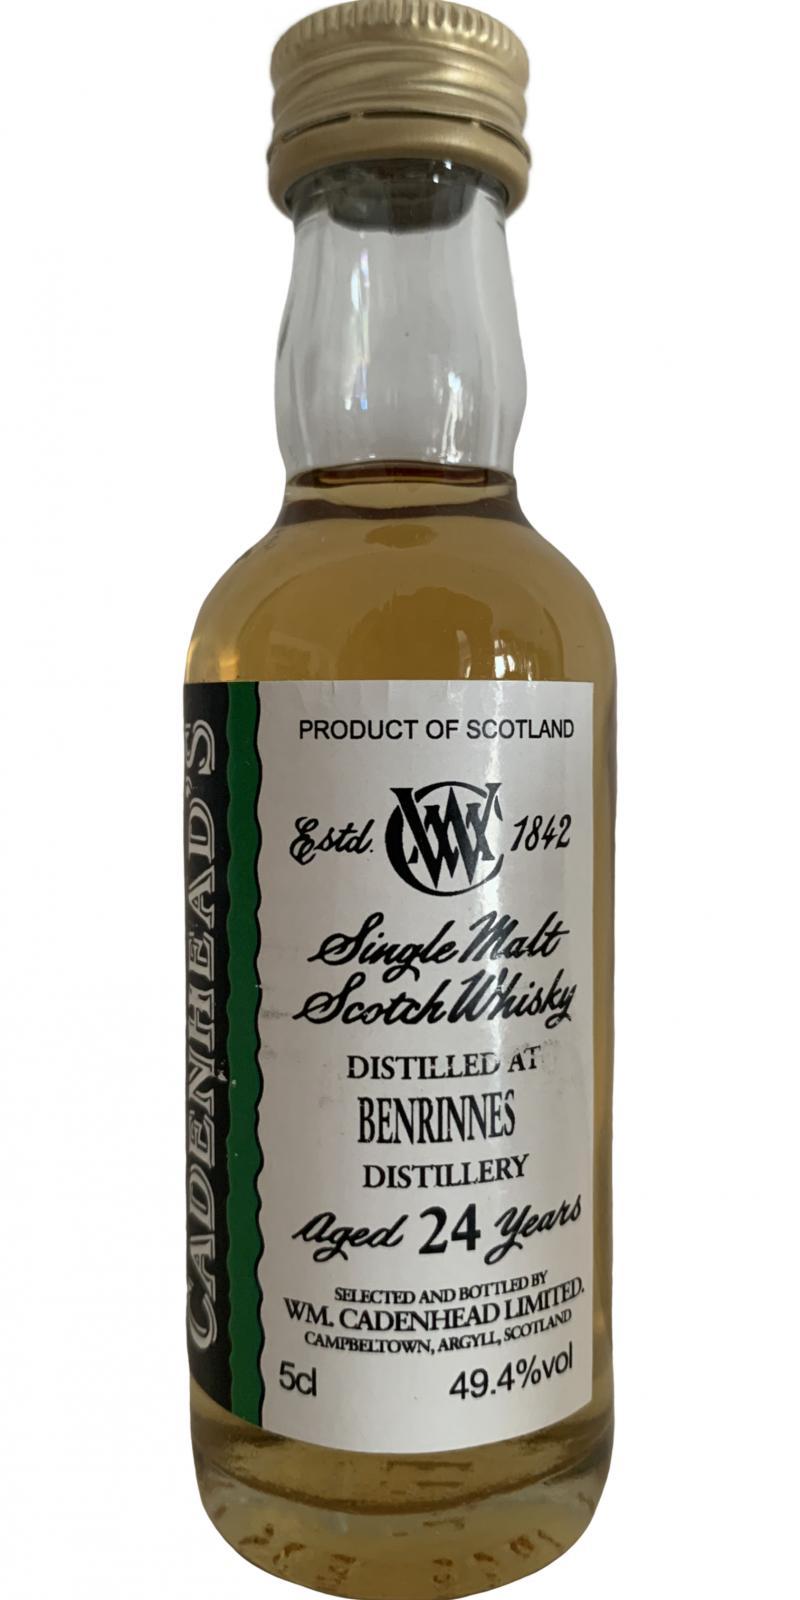 Benrinnes 1995 CA